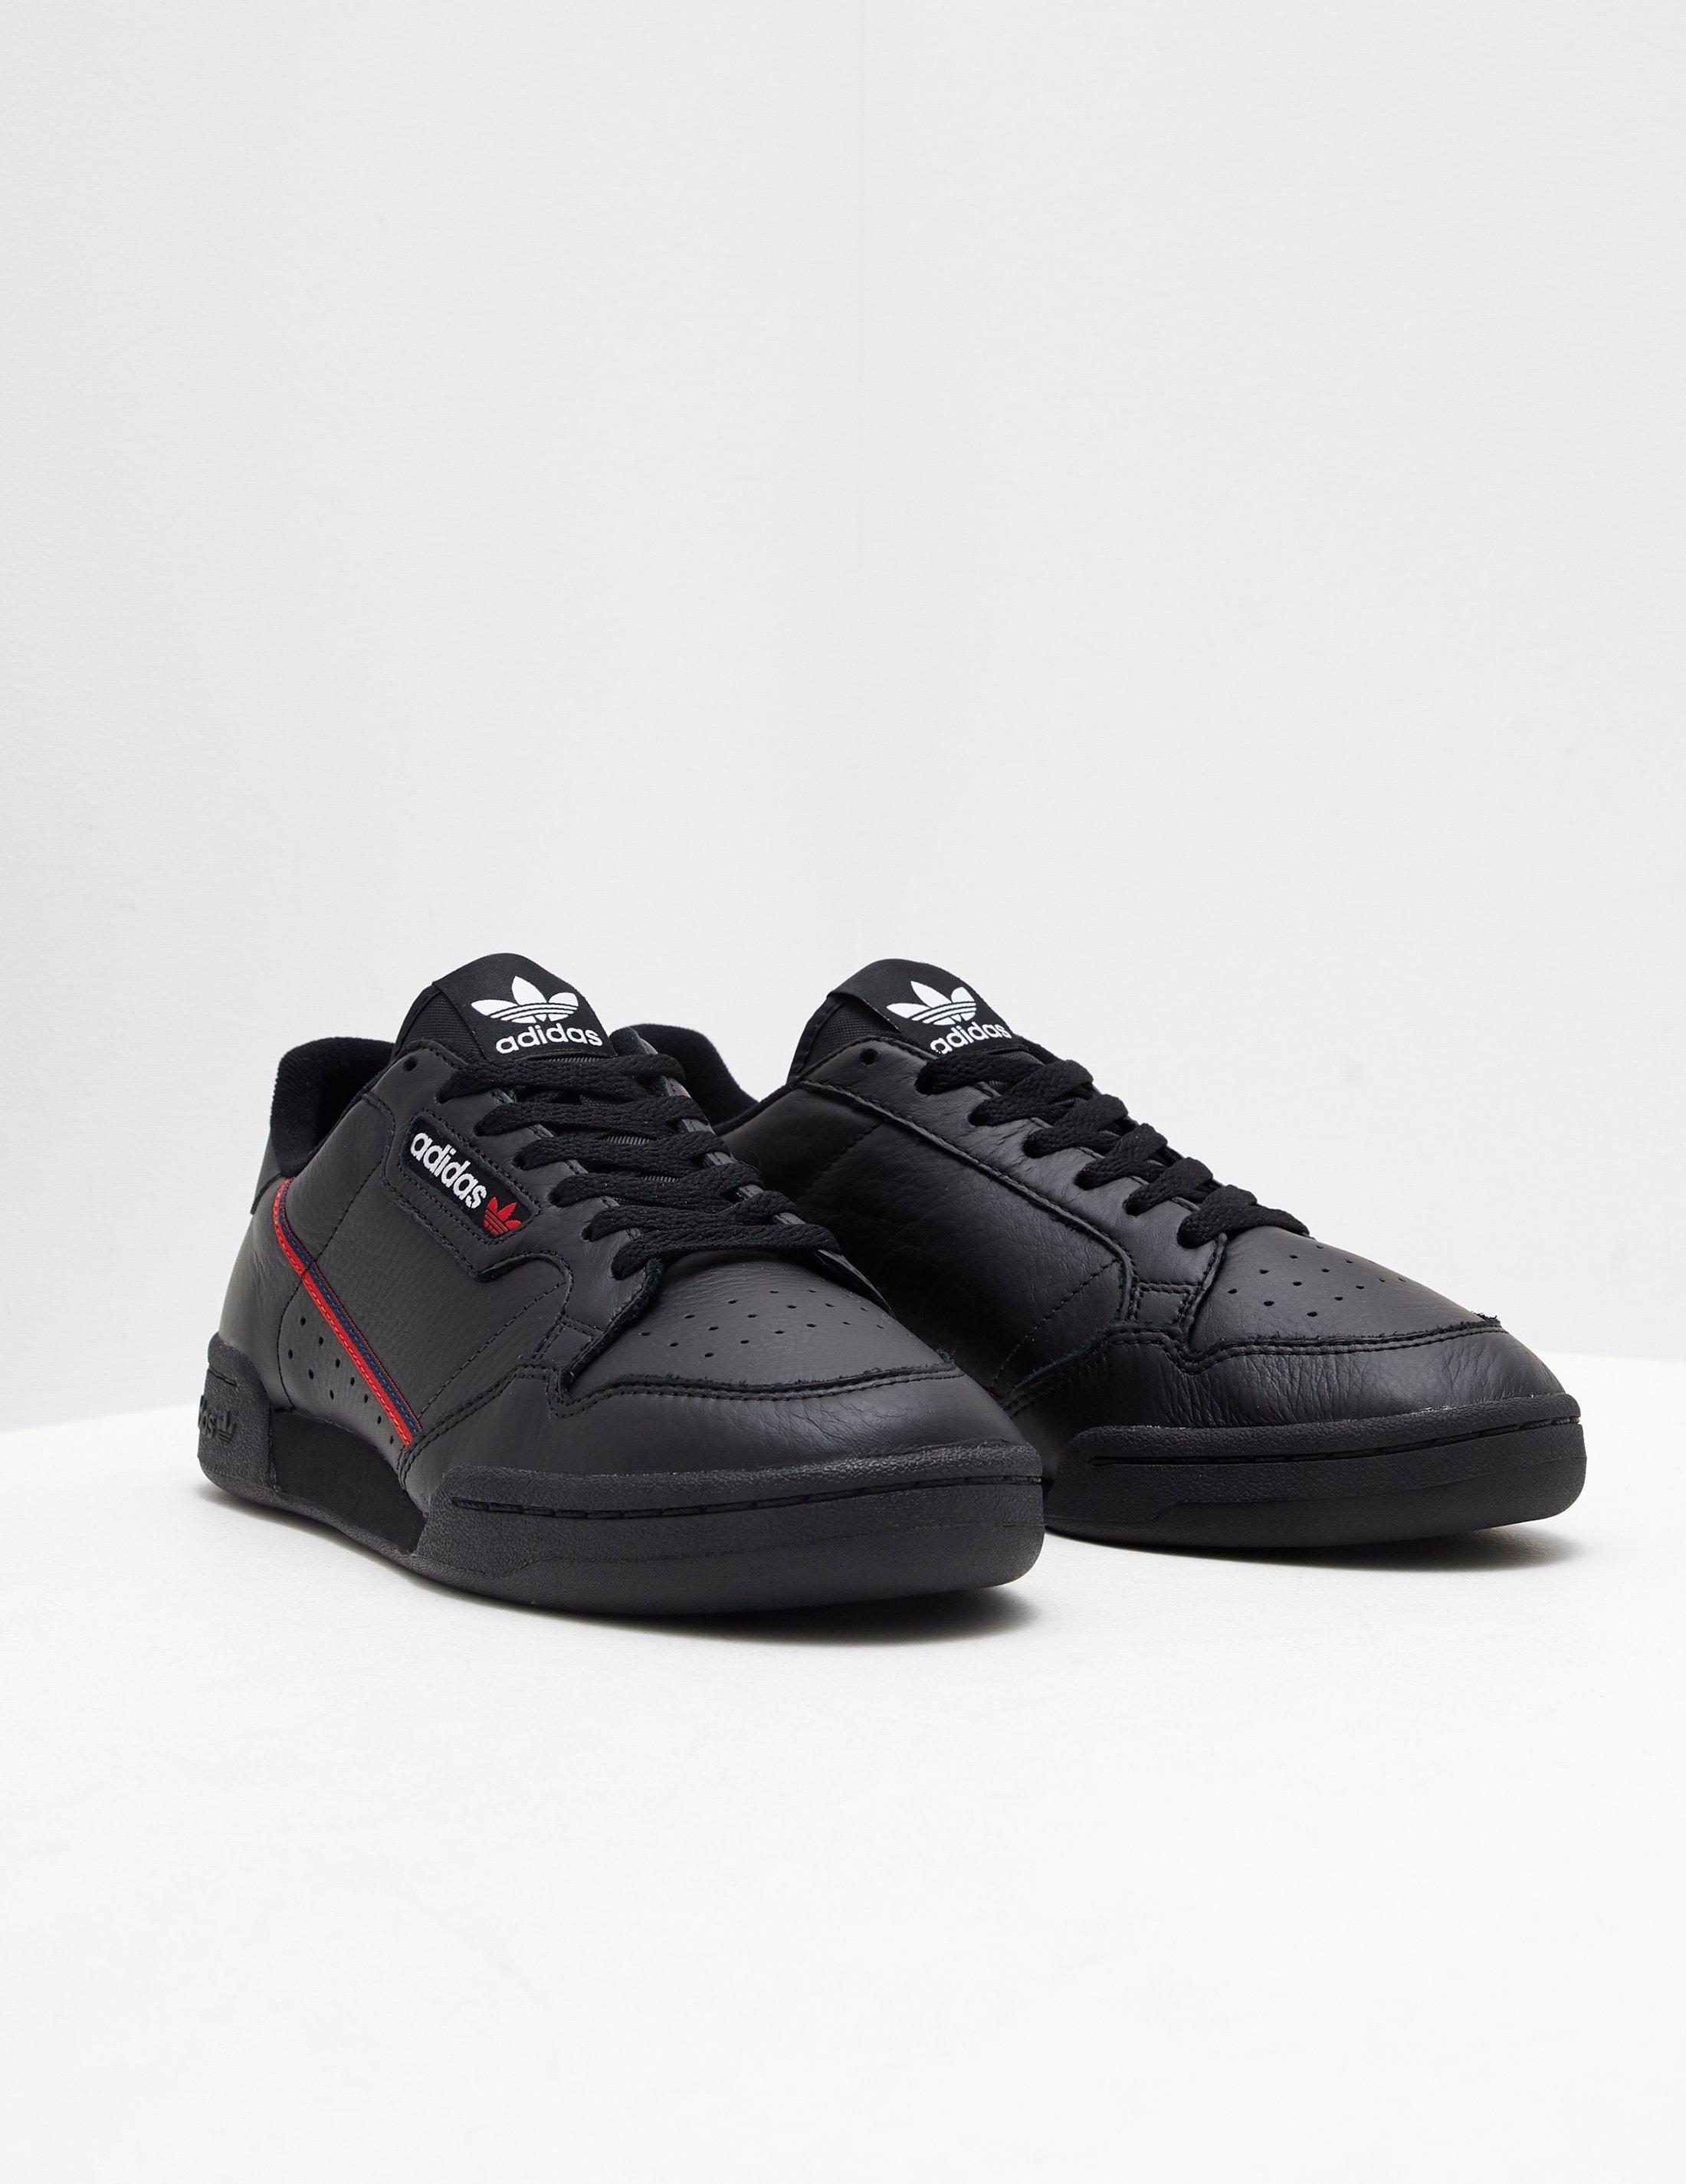 44ee0de48a adidas Originals Continental 80 Black in Black for Men - Save 21% - Lyst